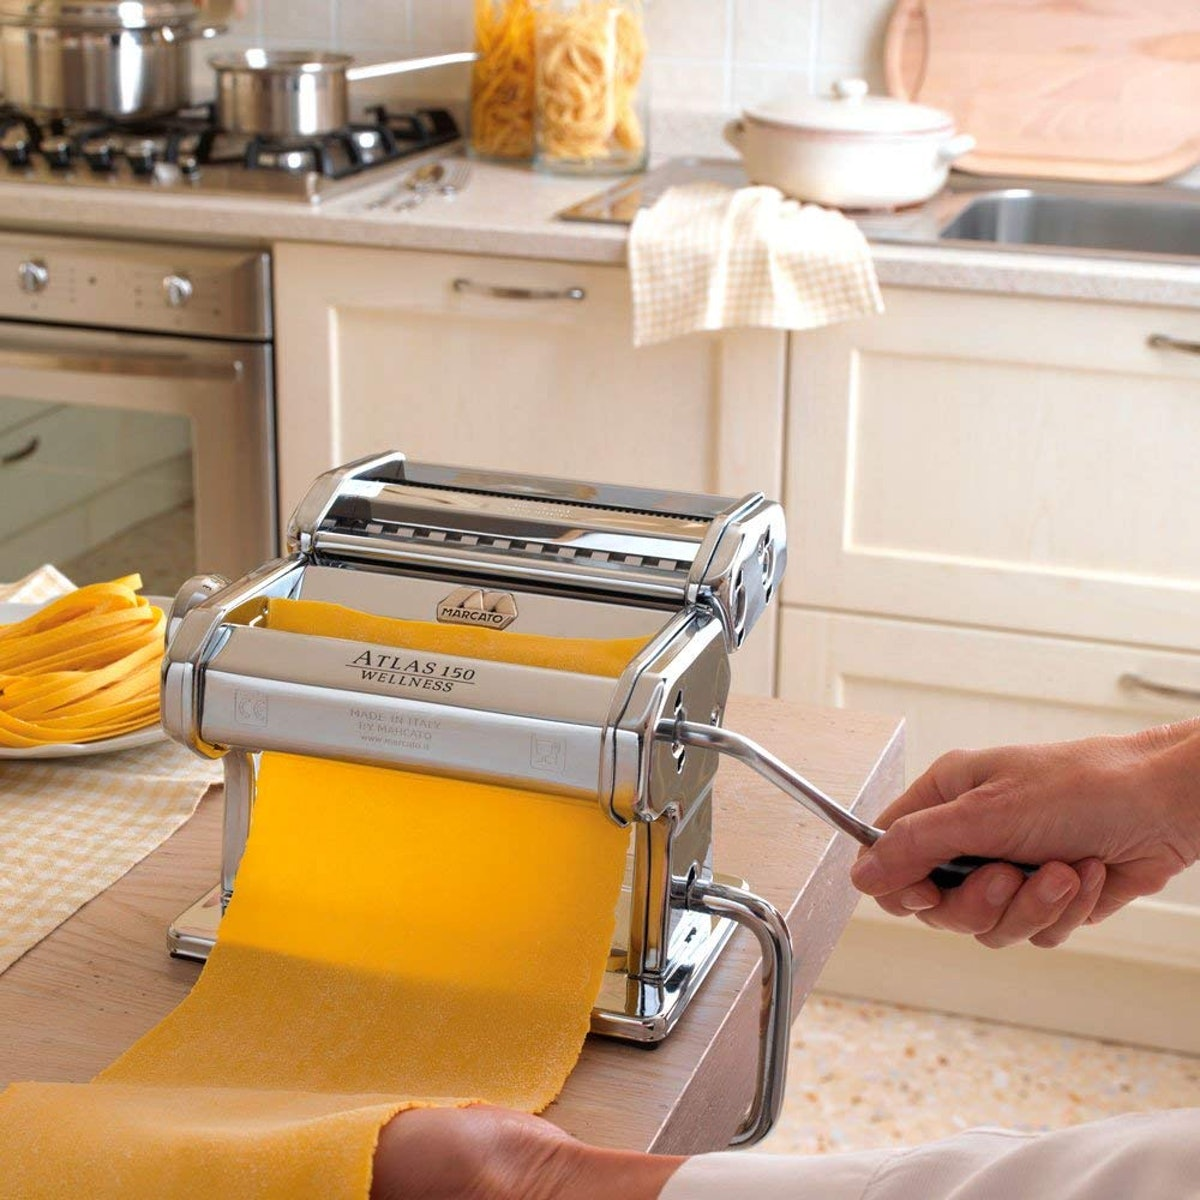 Marcato 8320 Atlas Pasta Machine